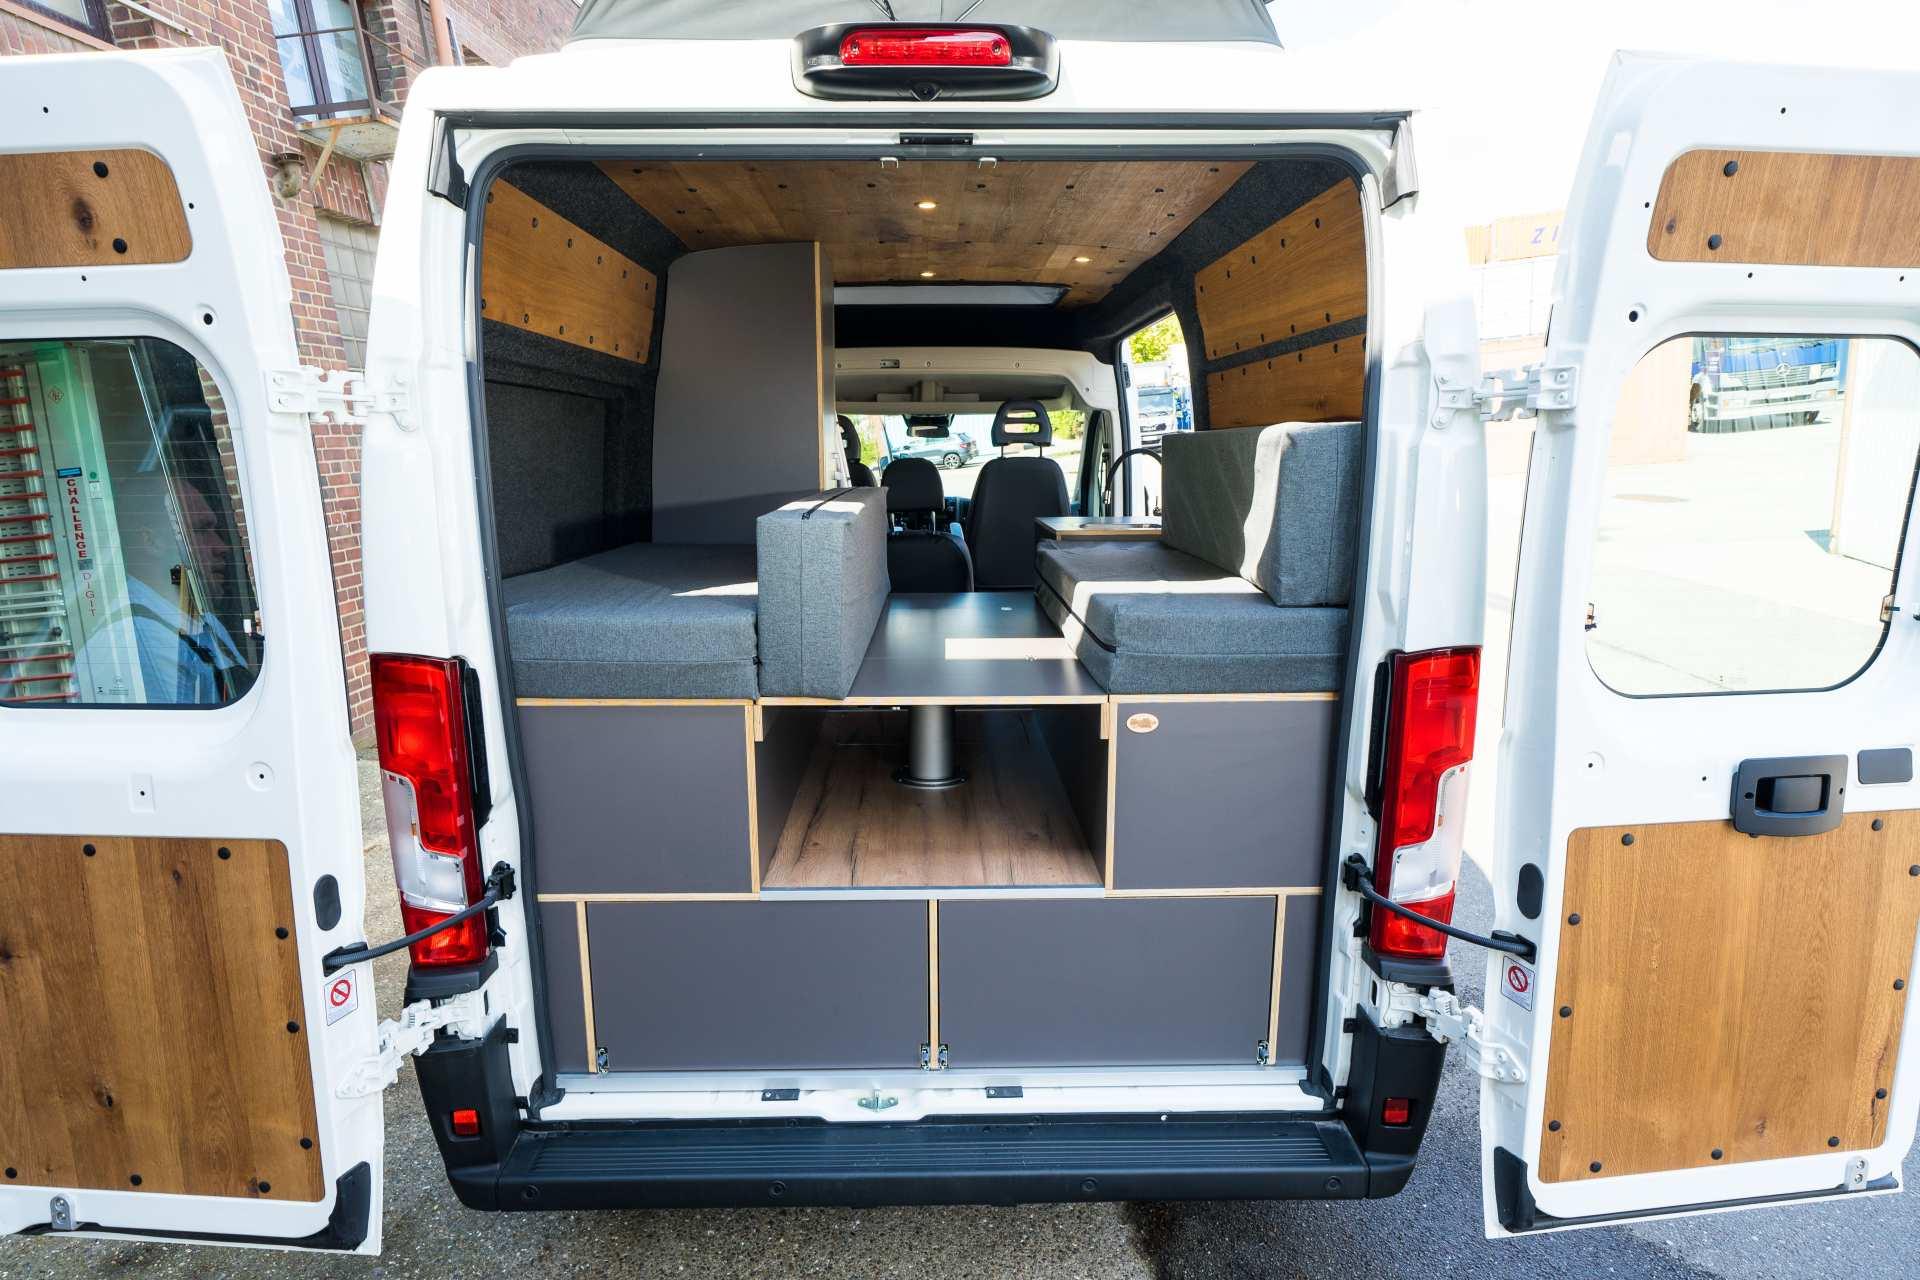 Individualausbau: Zwei-Raumwohnung Peugeot Boxer L2 H2 - 9